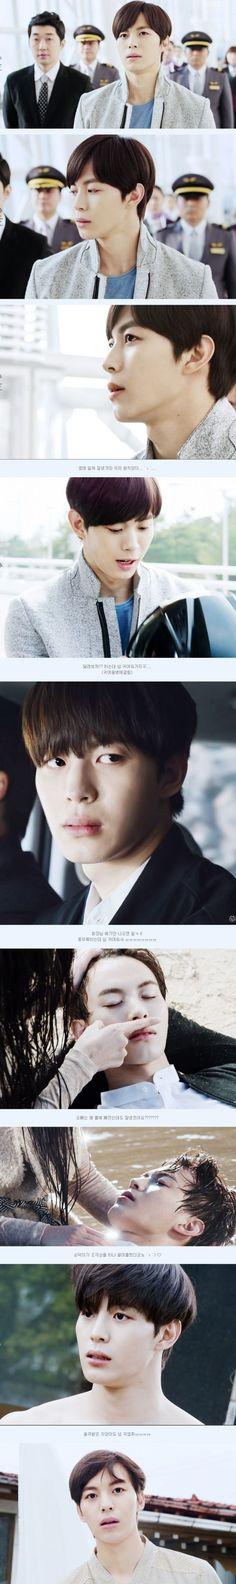 Added episode 1 captures for the Korean drama 'Moorim School'.